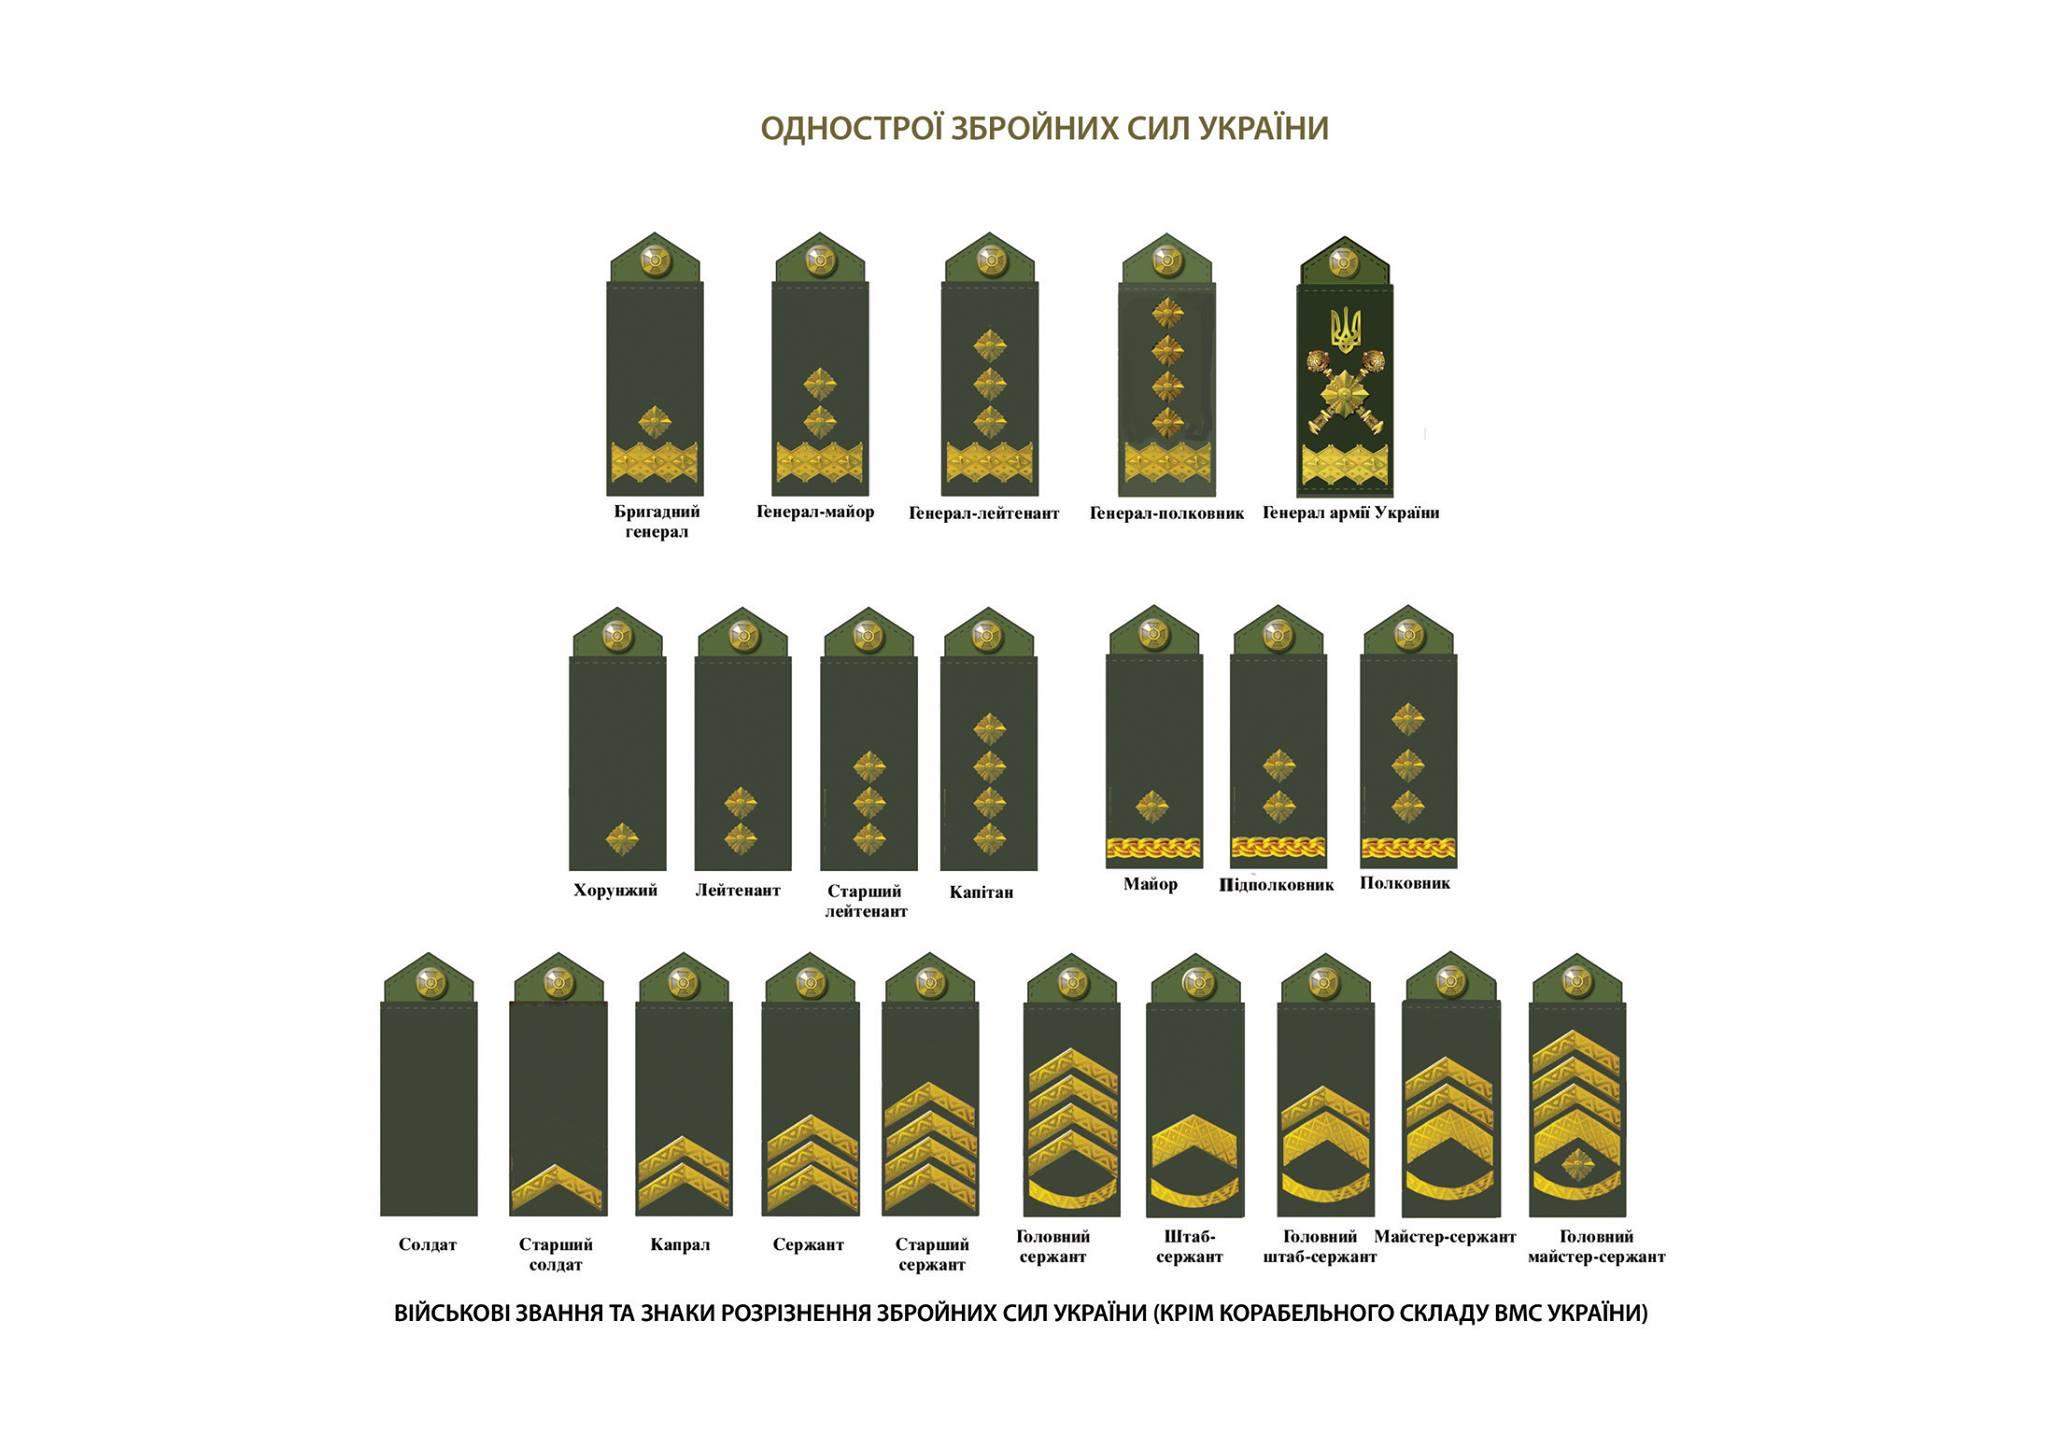 File:Military ranks of Ukraine 2016 (adopted).jpg - Wikimedia Commons